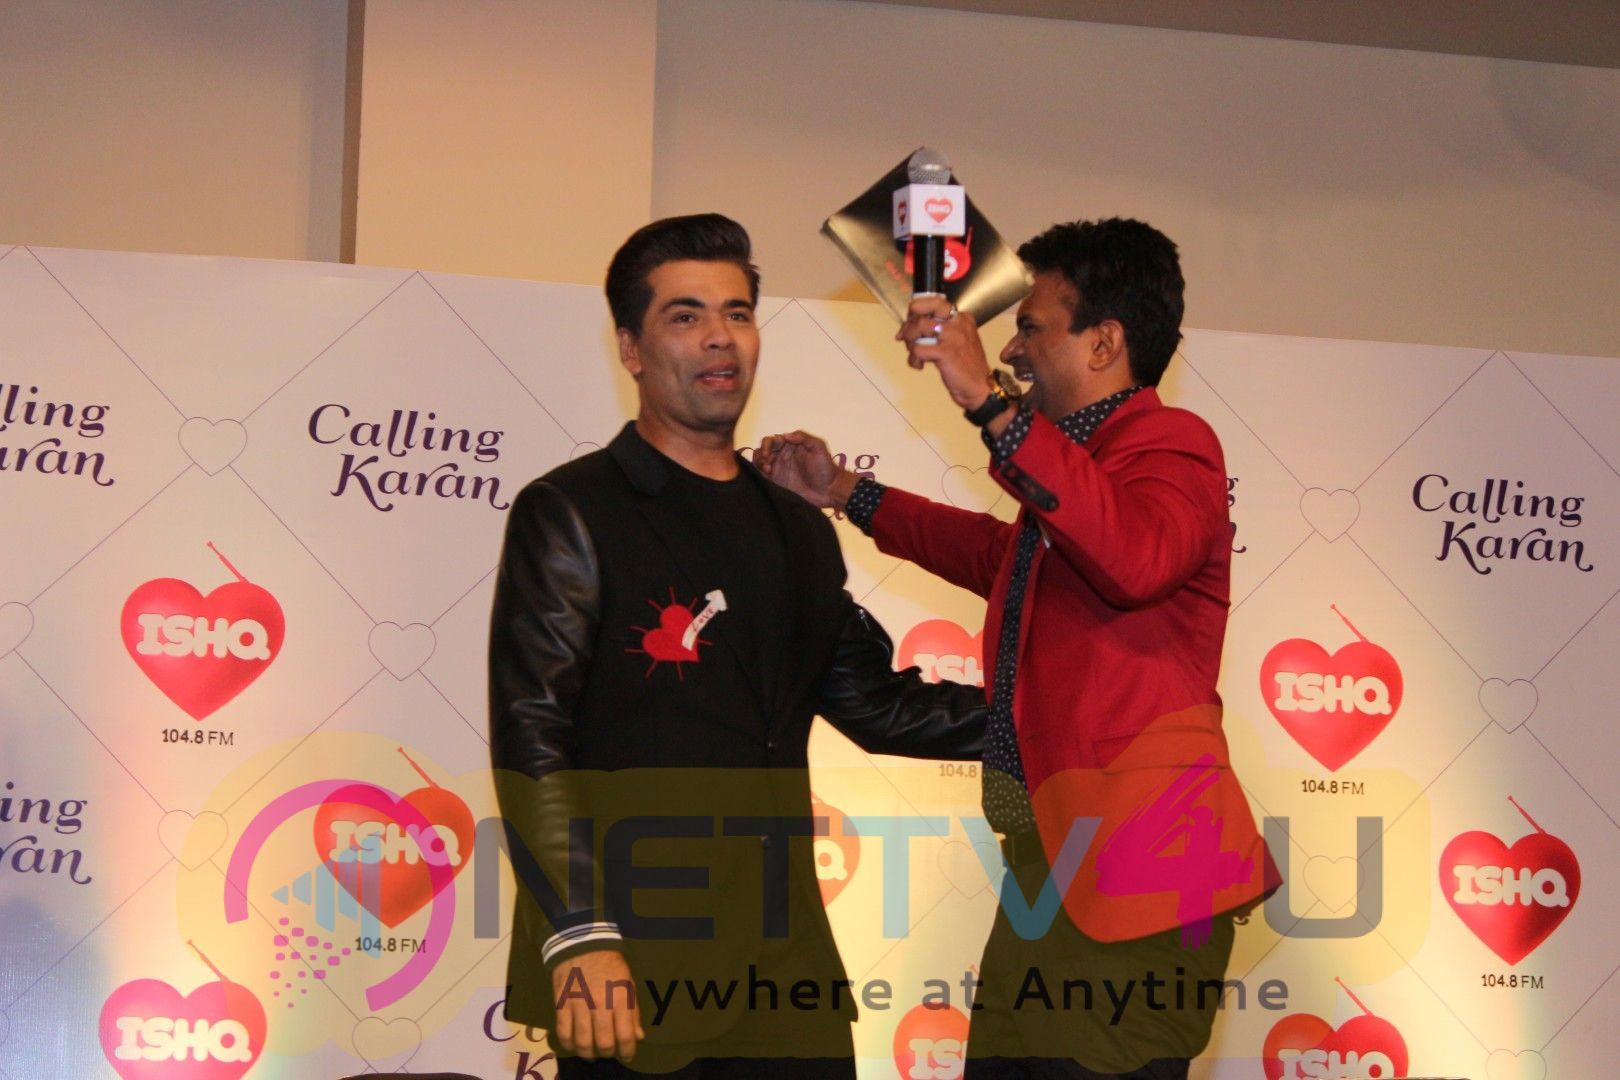 Ishq Fm Launch Radio Show Calling Karan With Karan Johar Images